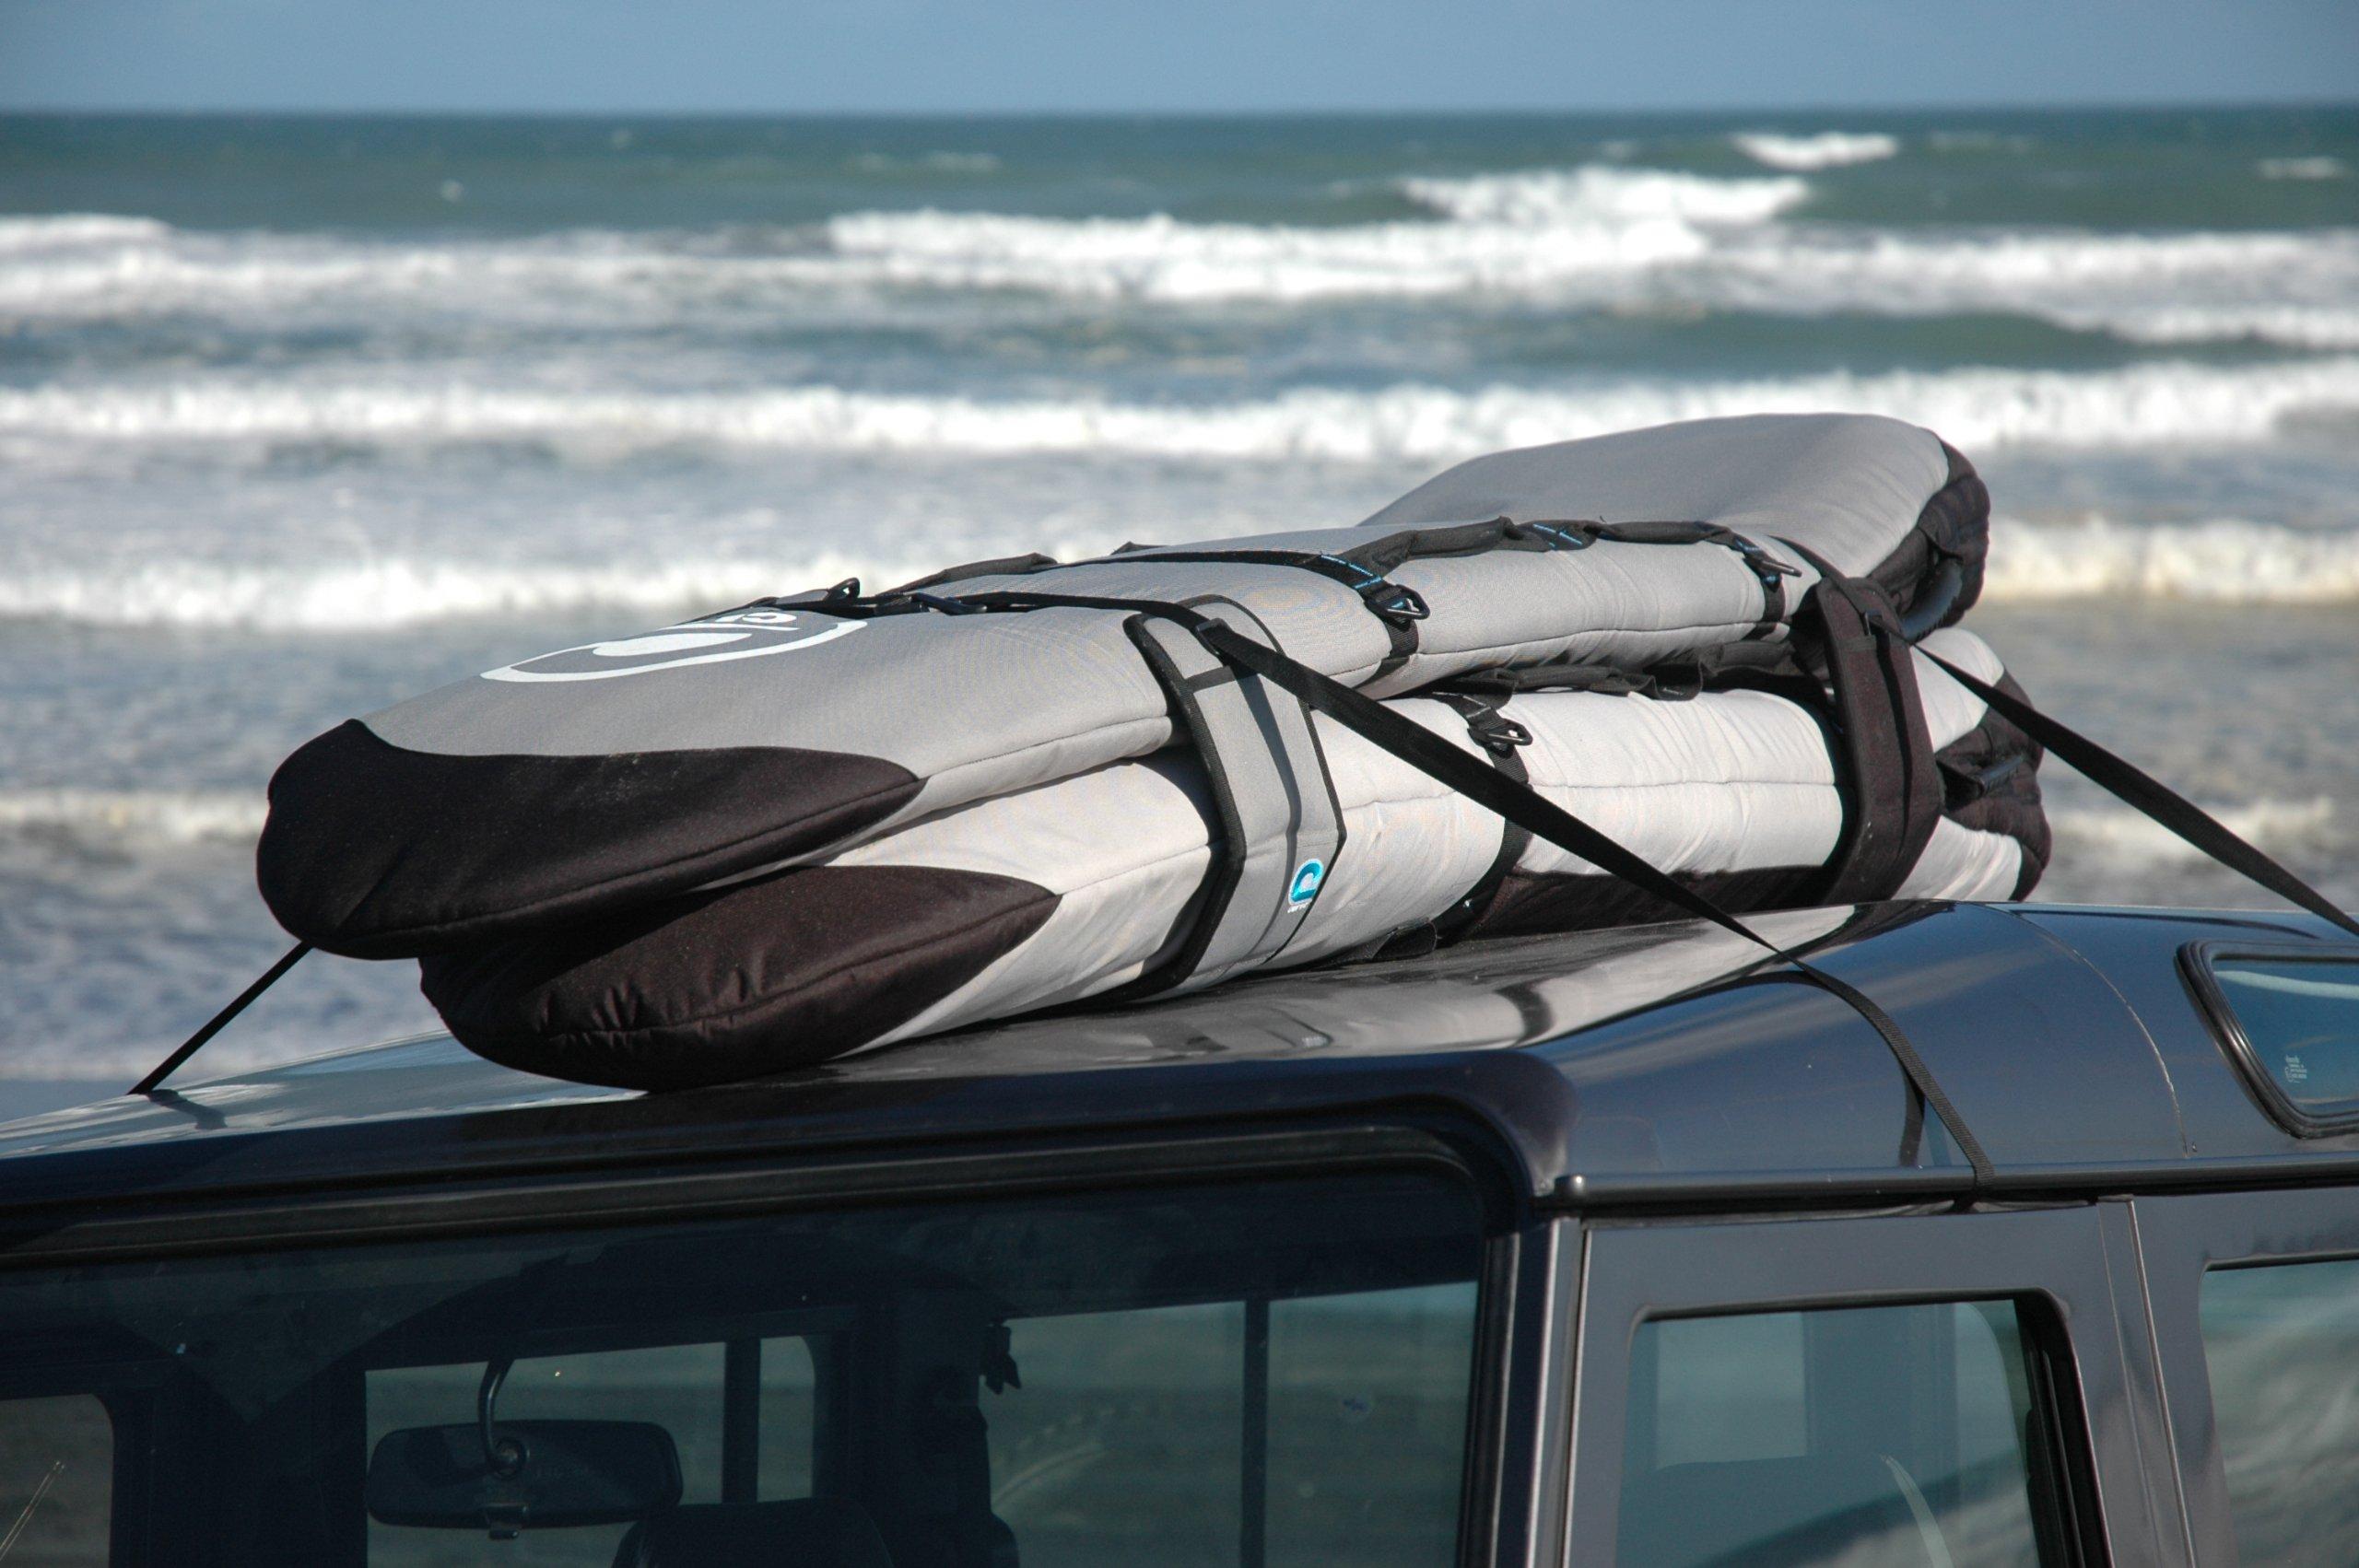 Surfboard Soft Rack LOCKDOWN Premium Surfboard Car Racks by Curve (set of 2) by Curve (Image #7)